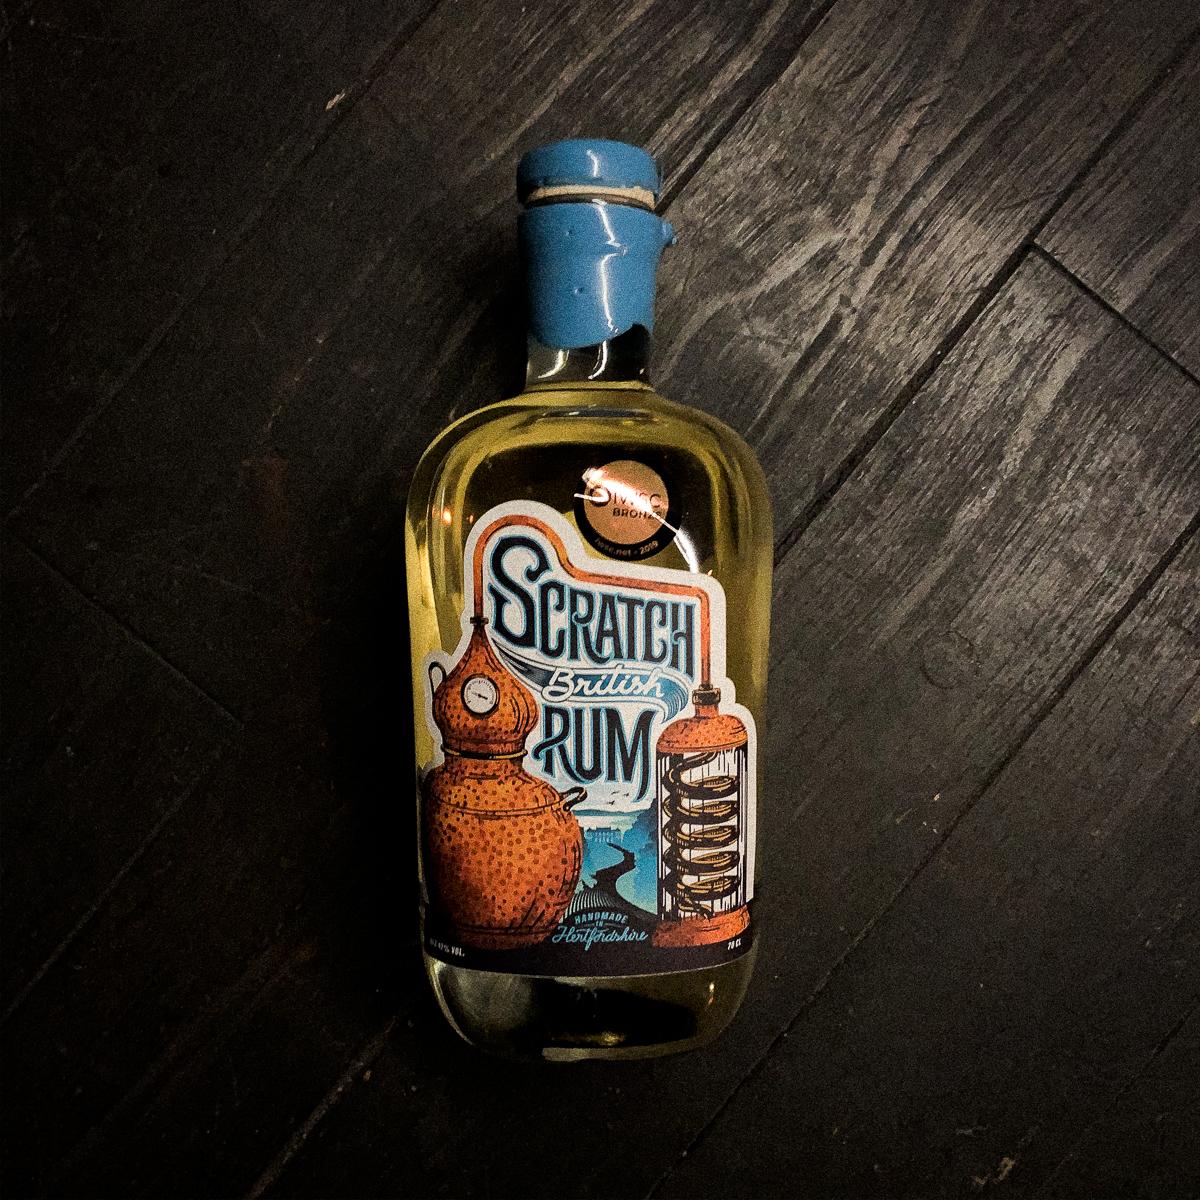 Scratch British Rum